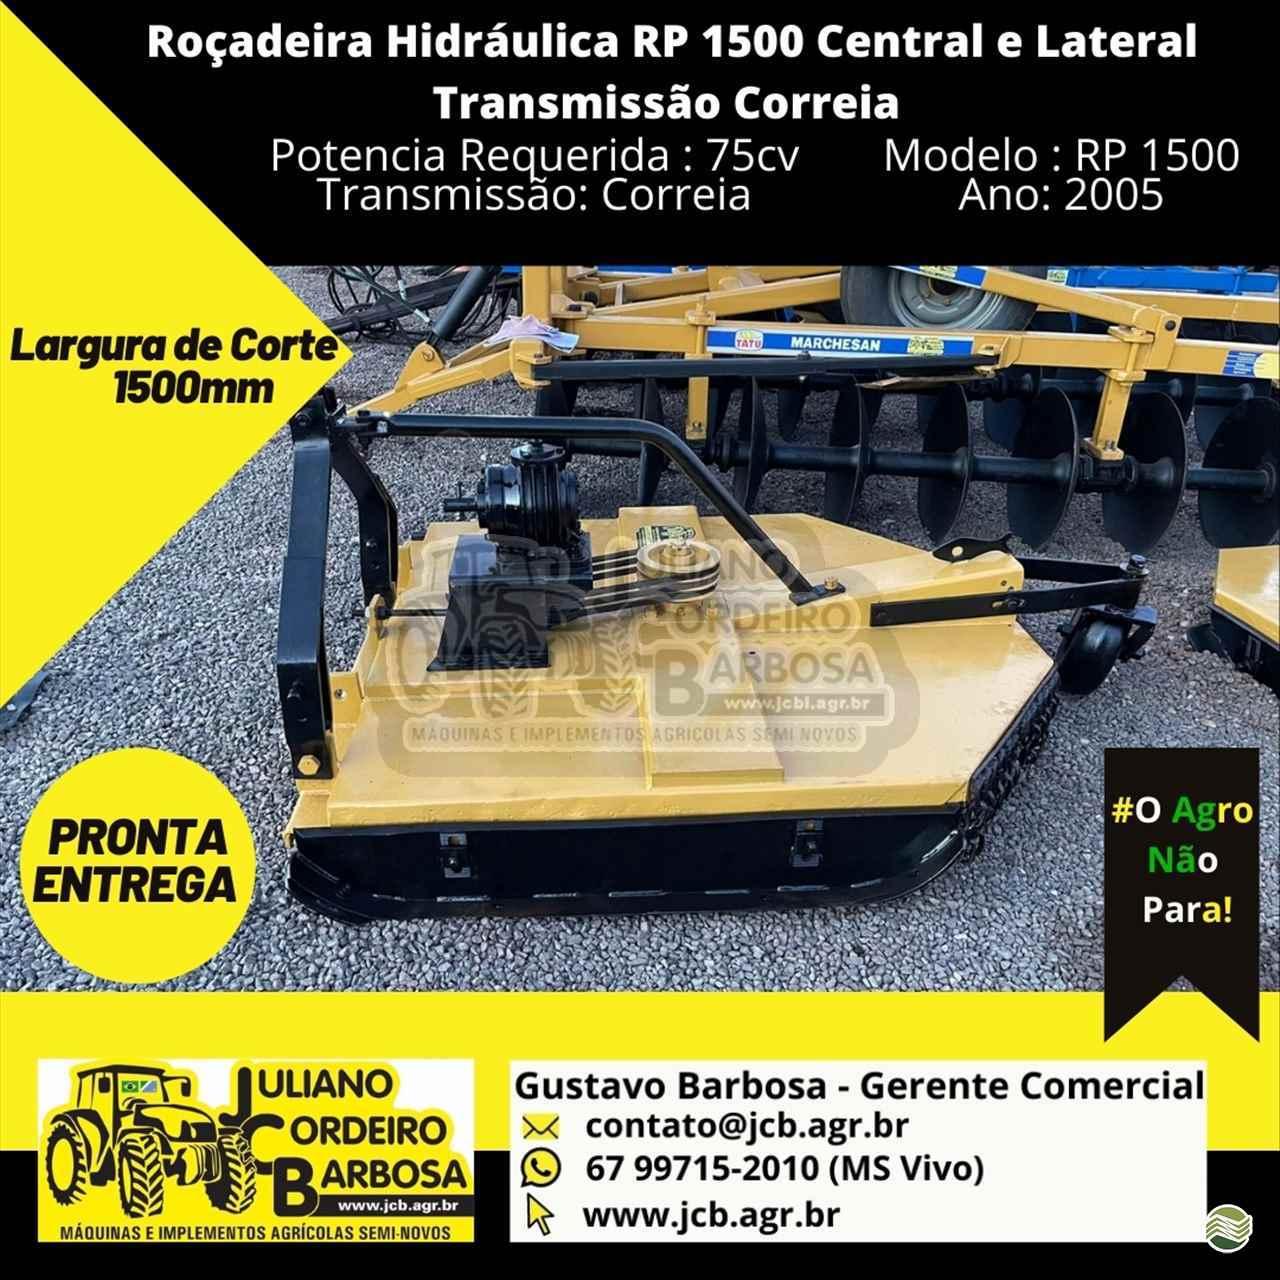 ROCADEIRA HIDRÁULICA de JCB Máquinas e Implementos Agrícolas - MARACAJU/MS